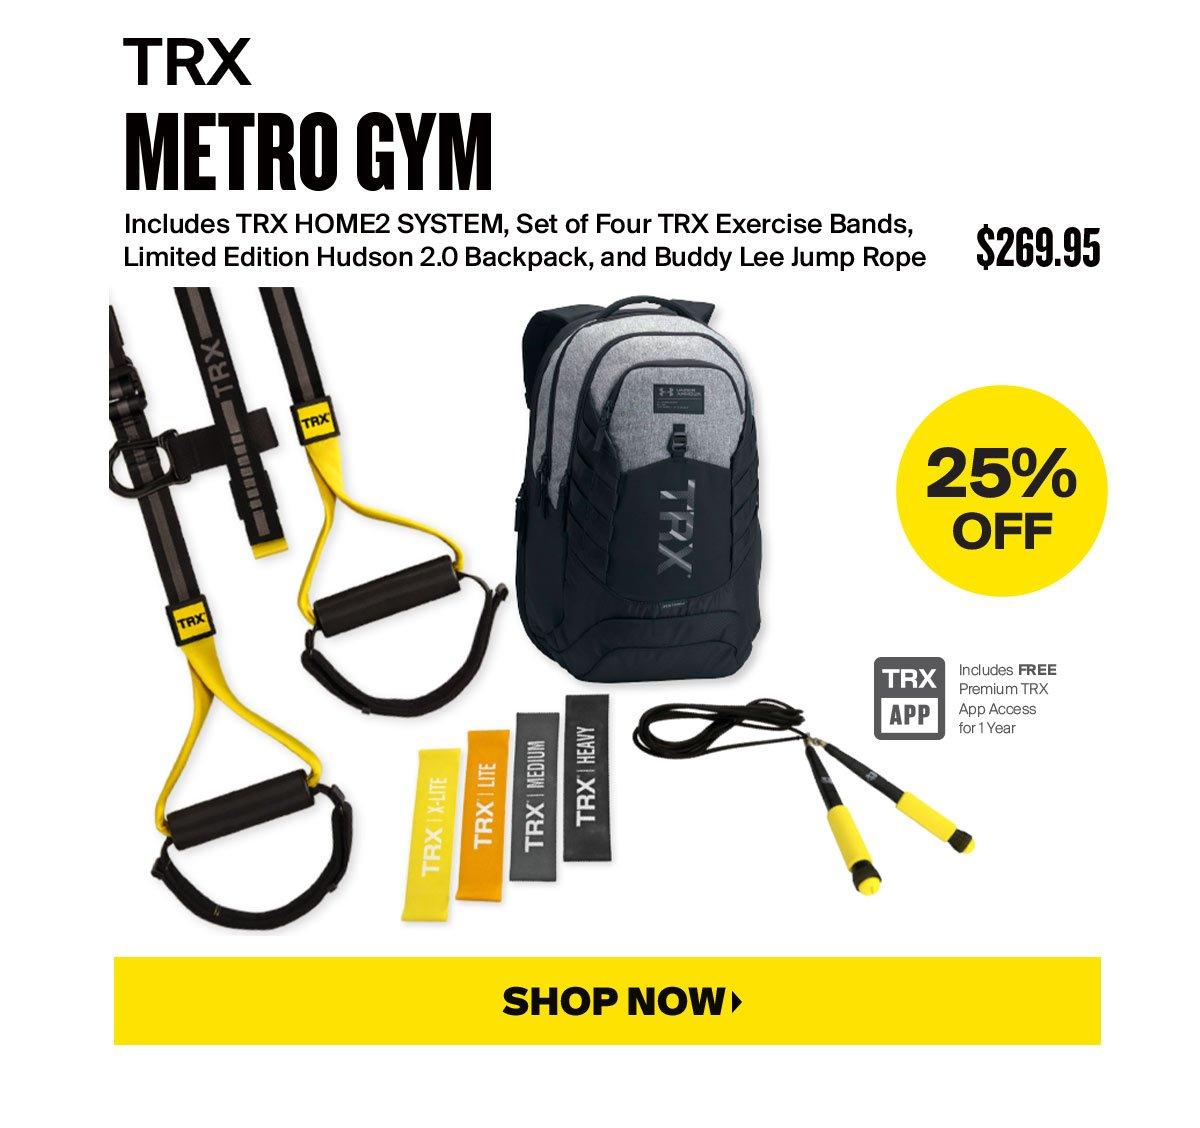 25% OFF TRX METRO GYM   $269.95   SHOP NOW >